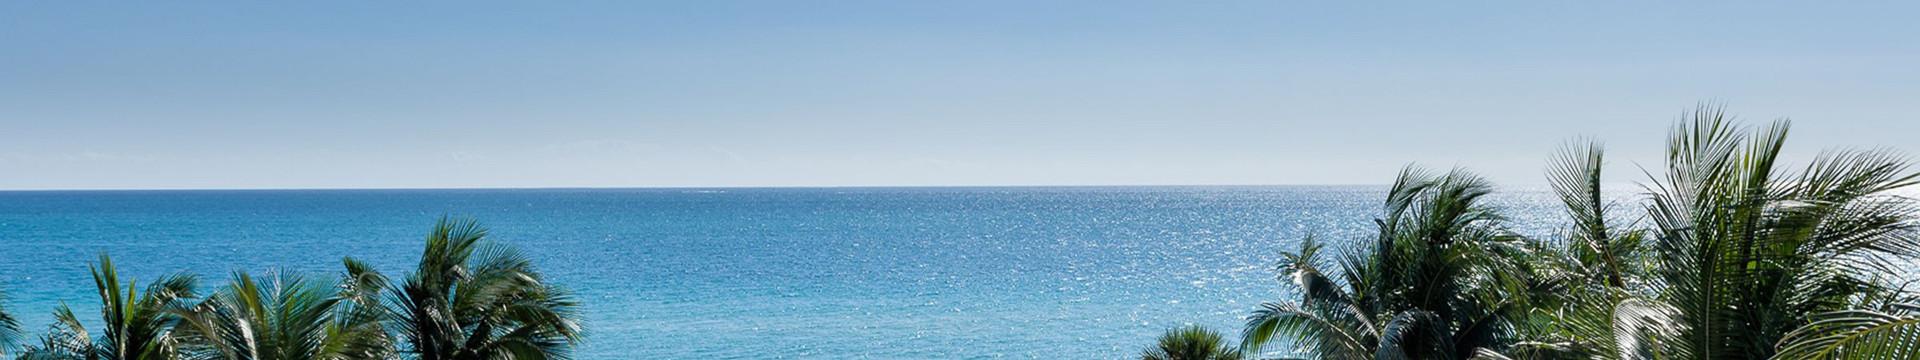 Beach with palm beach - Westgate Resorts